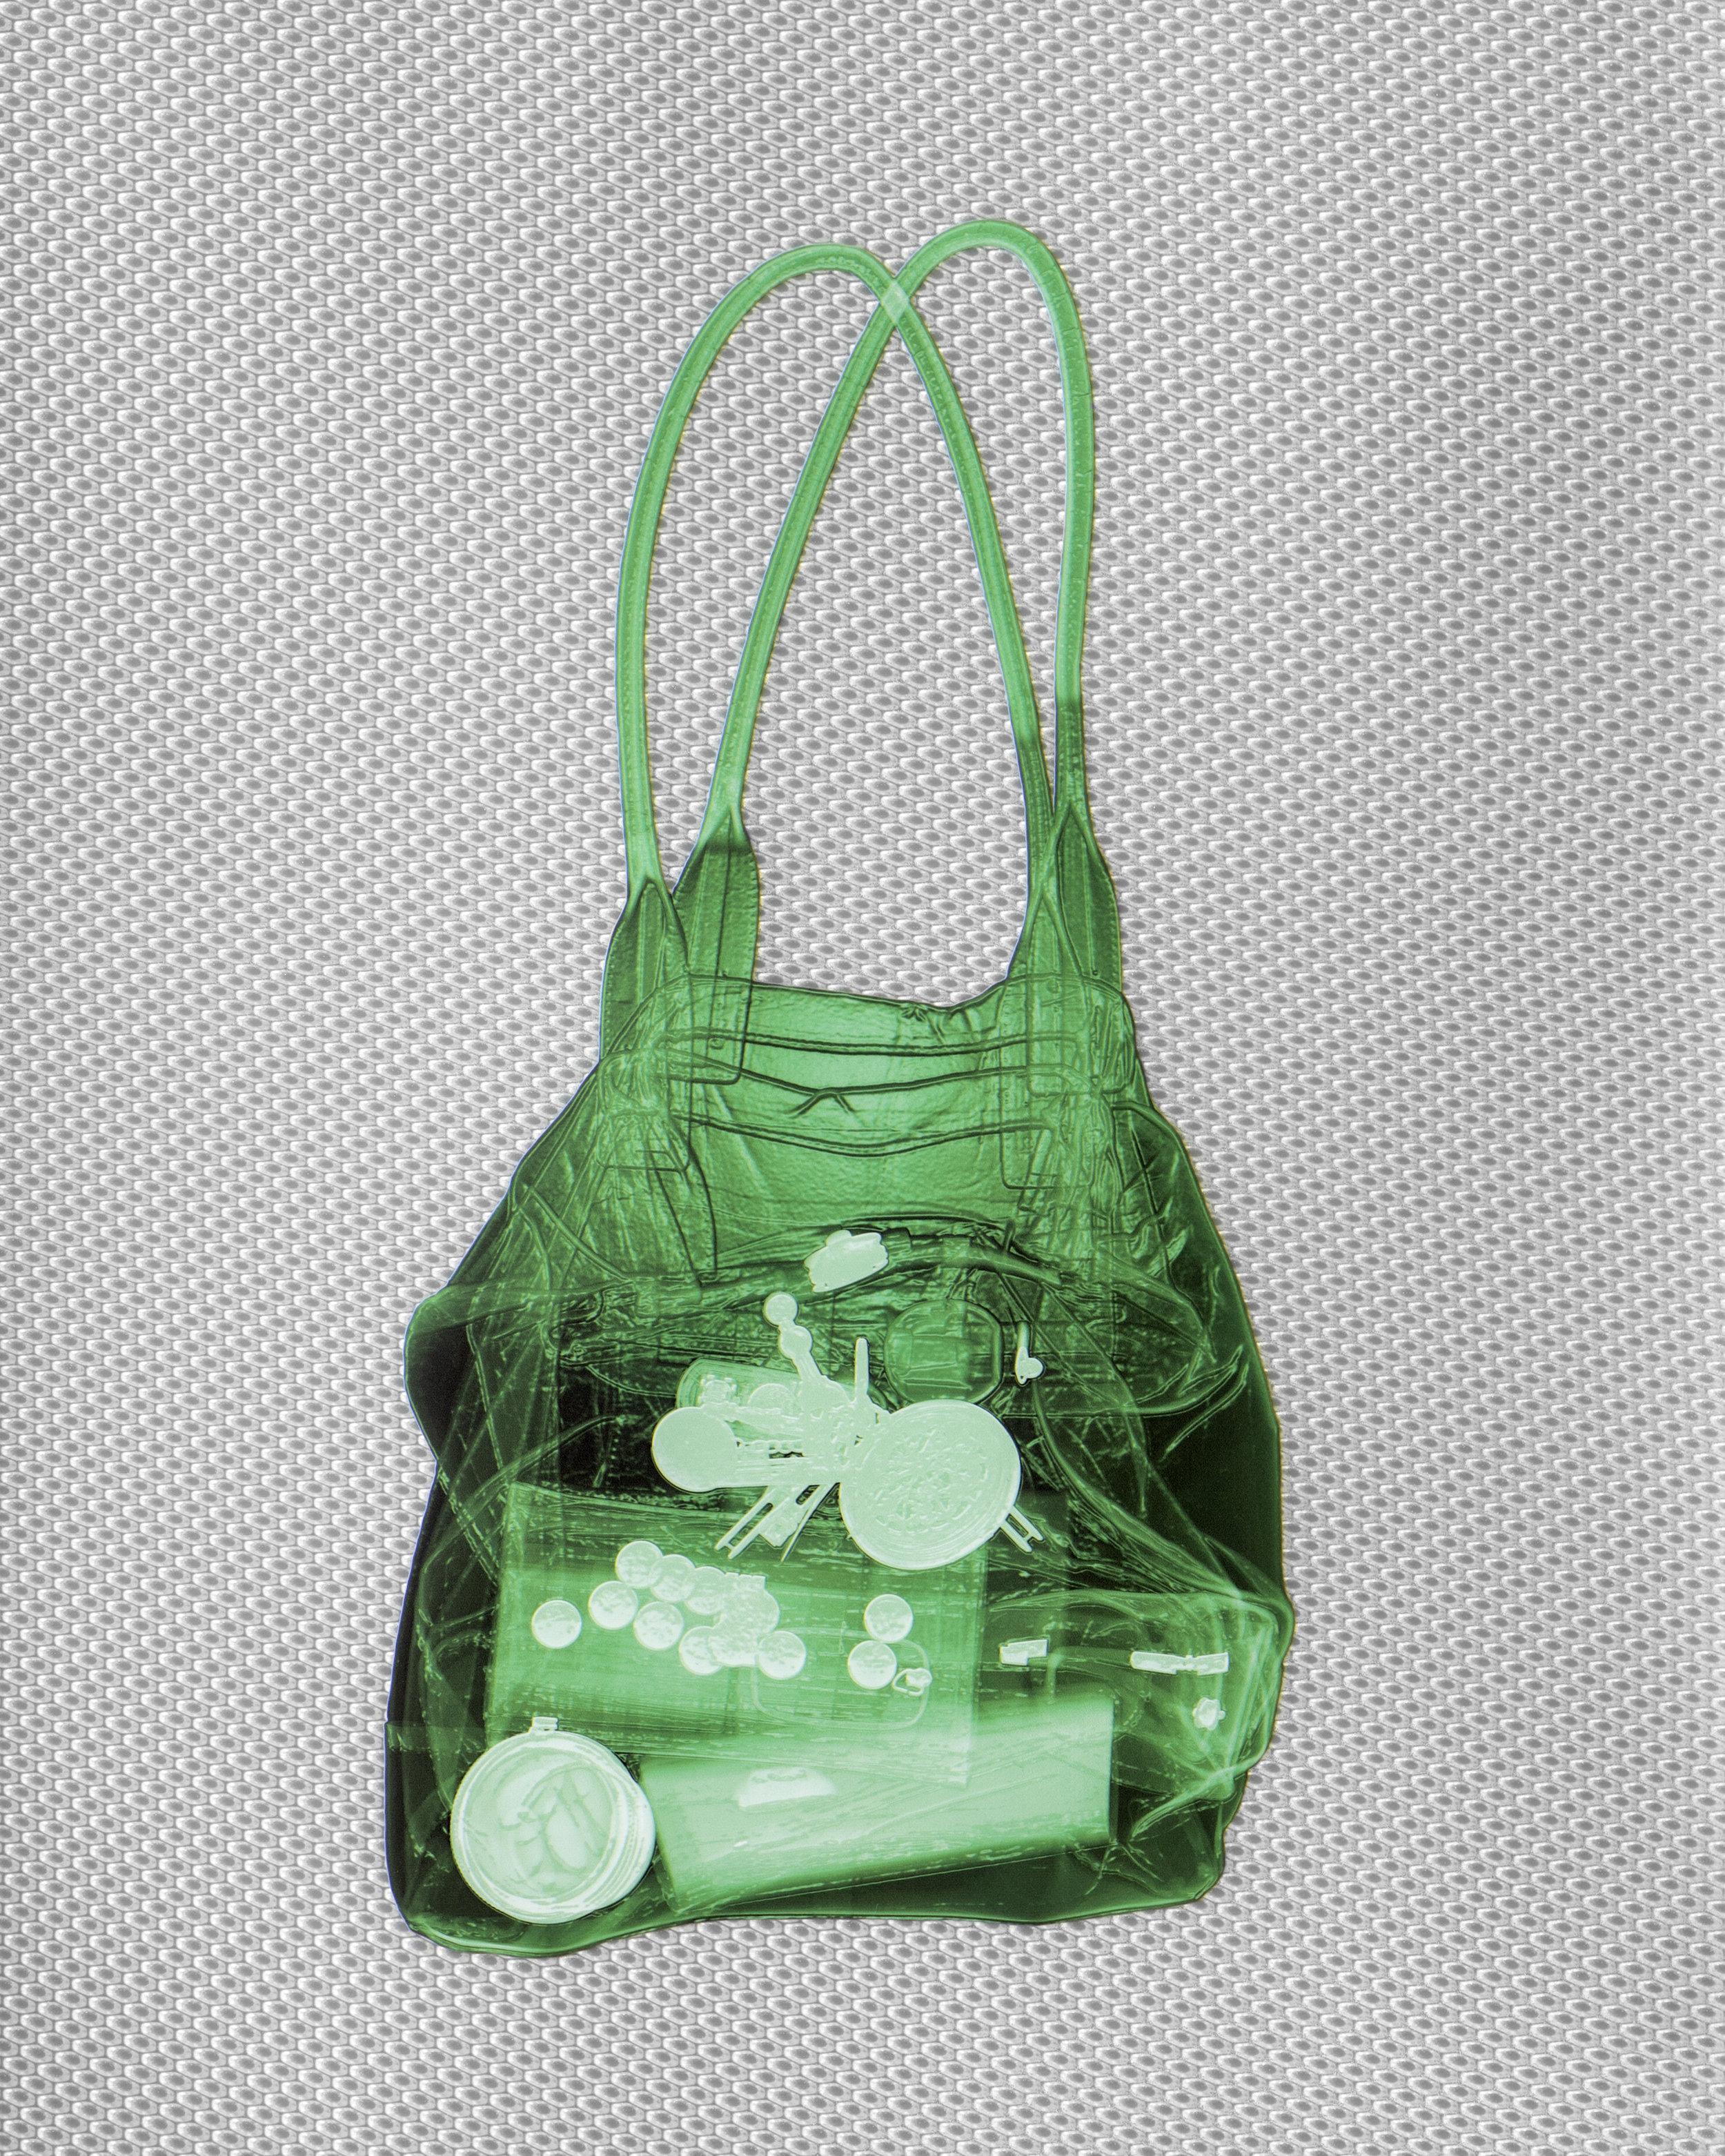 Green Purse